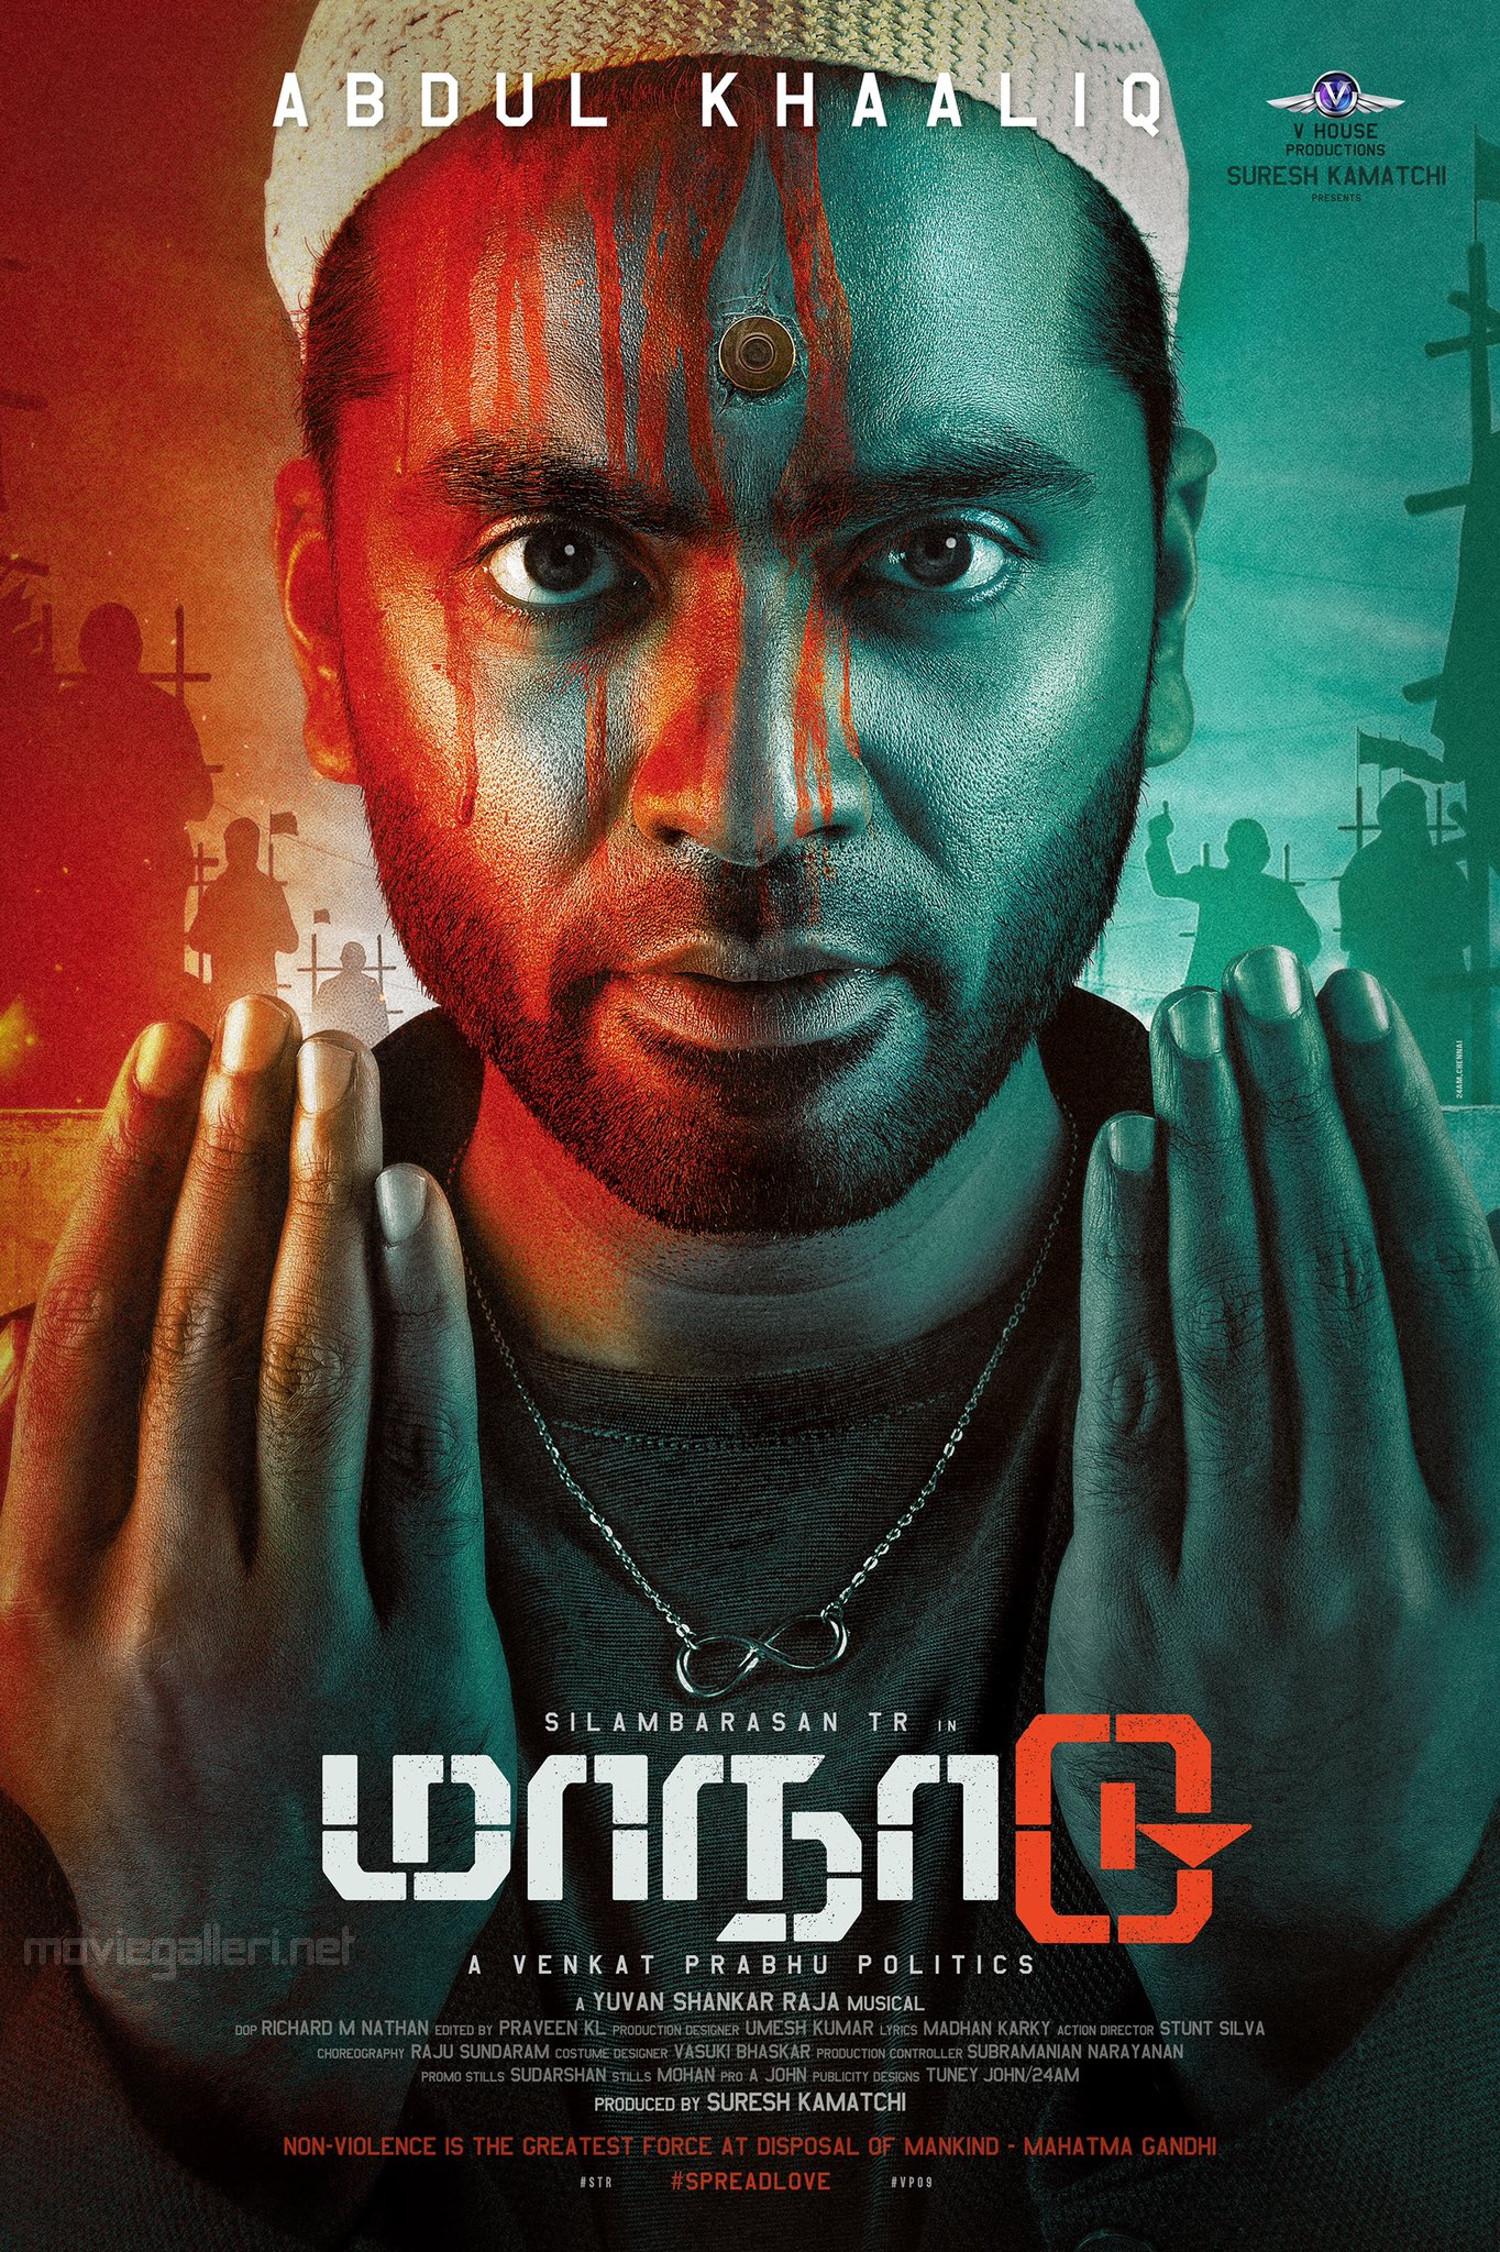 Hero Silambarasan TR as Abdul Khaaliq in Maanadu Movie First Look Poster HD